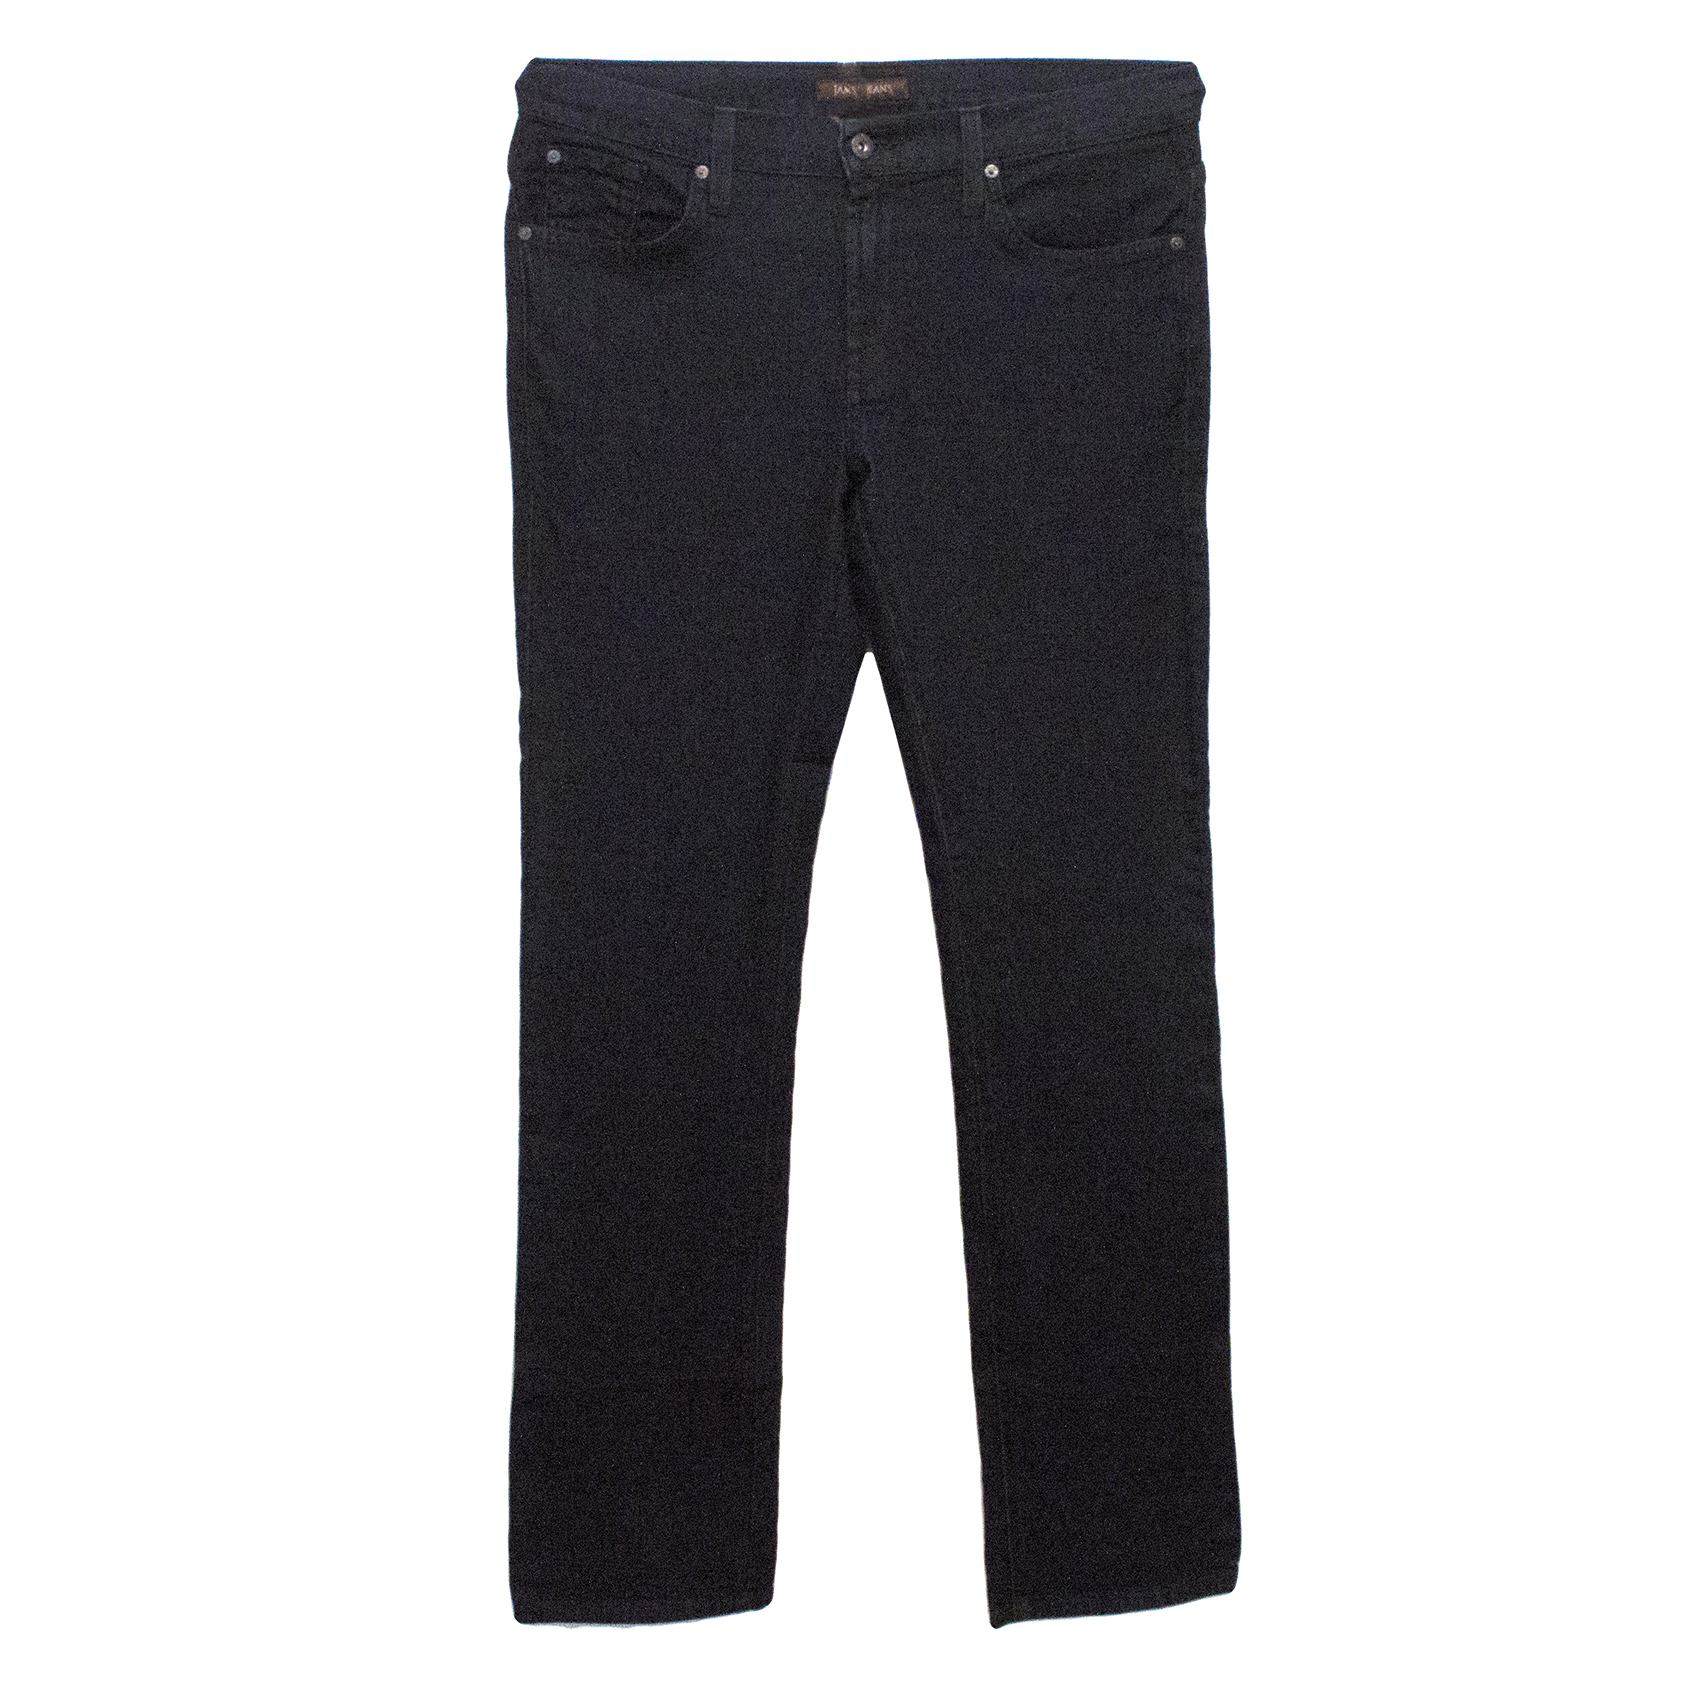 James Jeans Dark Denim Straight Legged Jeans